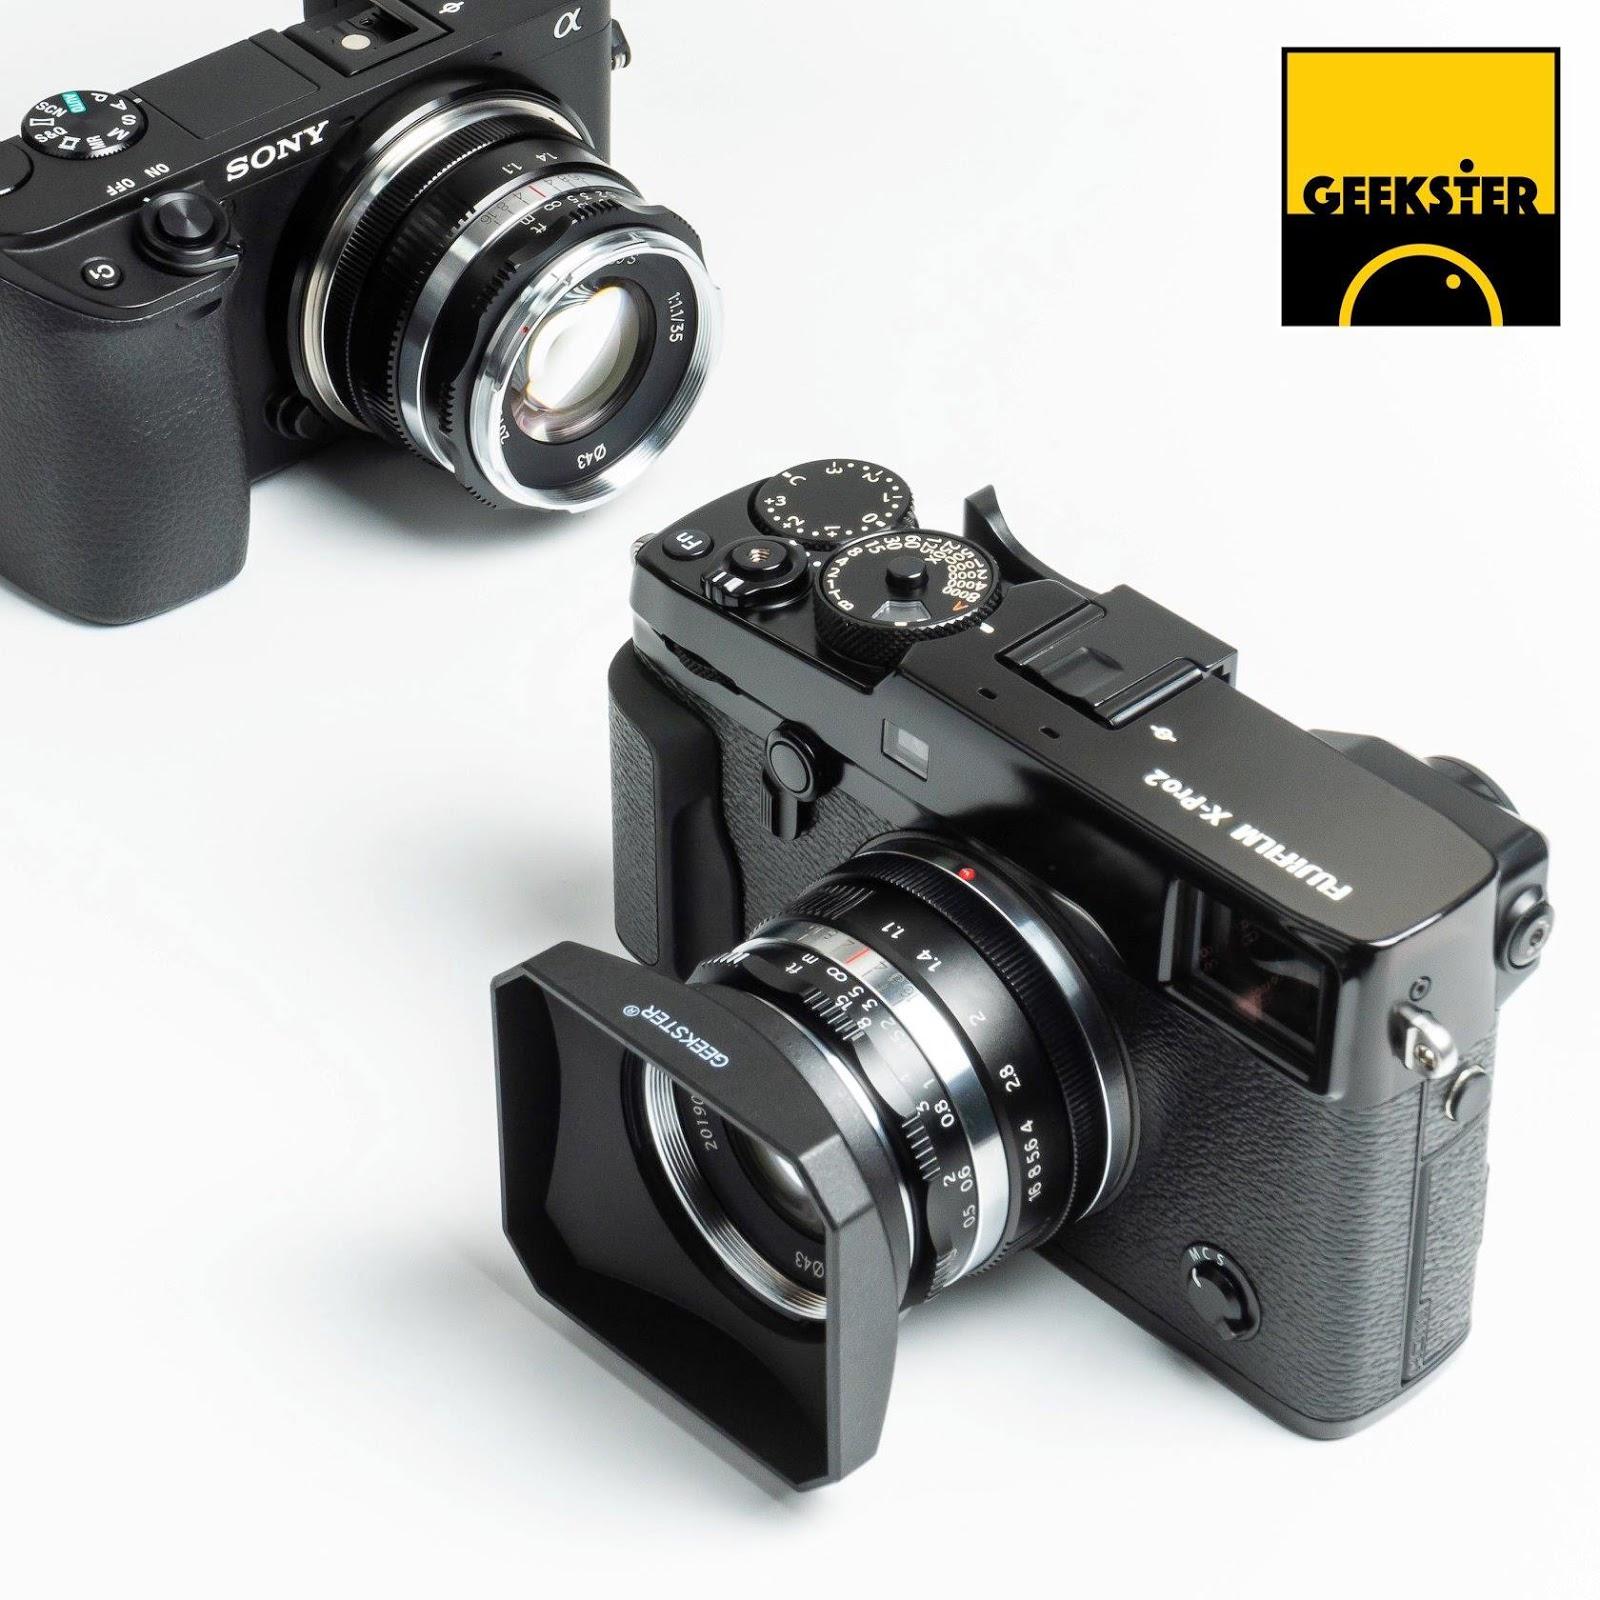 Объектив Geekster 35mm f/1.1 с камерой Fujifilm